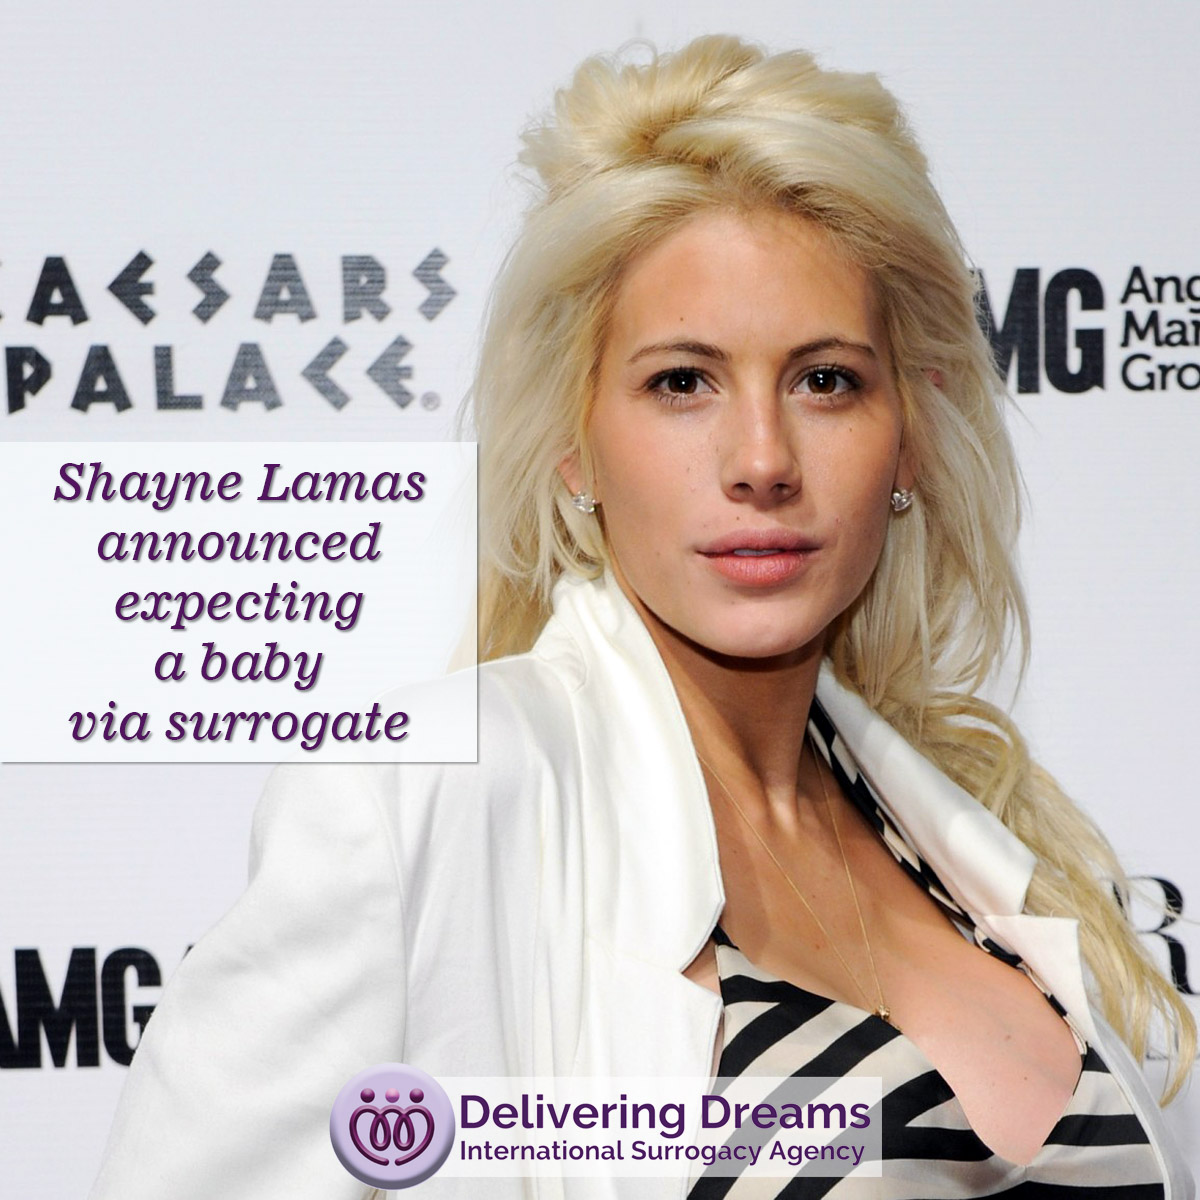 Shayne Lamas Announced Expecting A Baby Via Surrogate